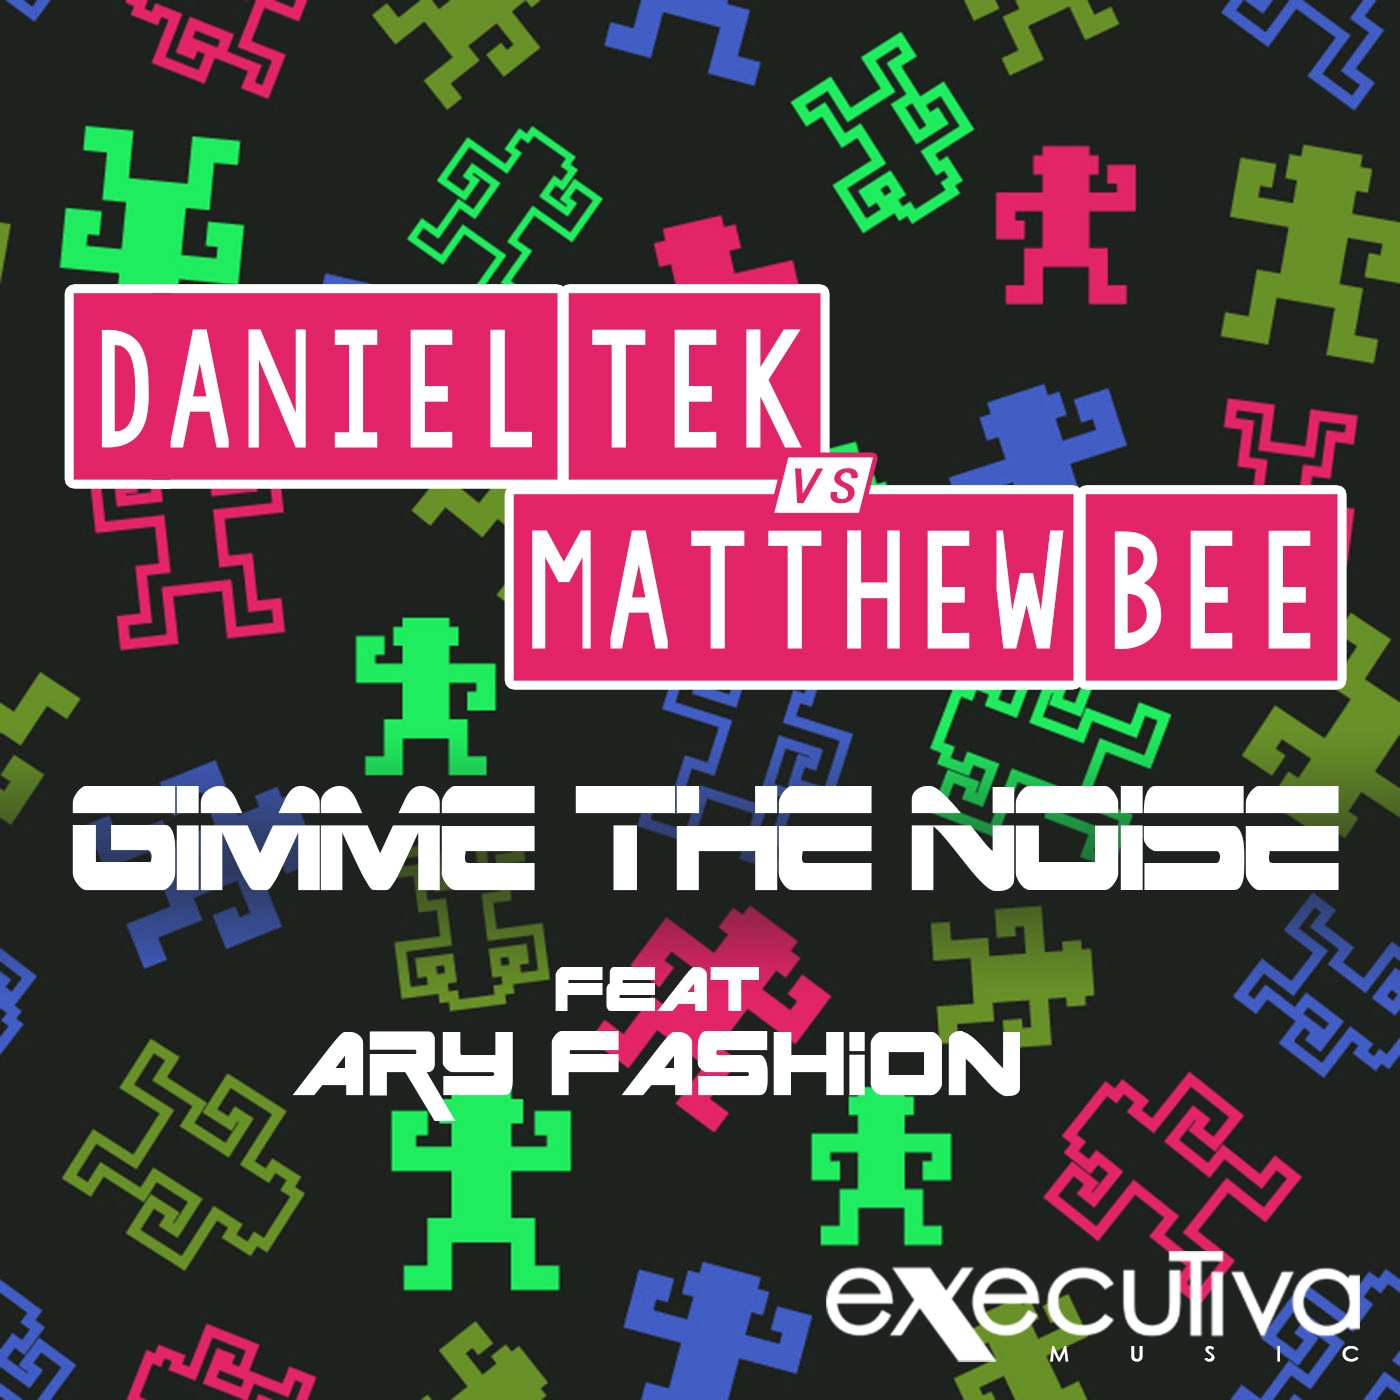 Daniel Tek & Matthew Bee - Gimme The Noise Feat. AryFashion (Delphine Remix)